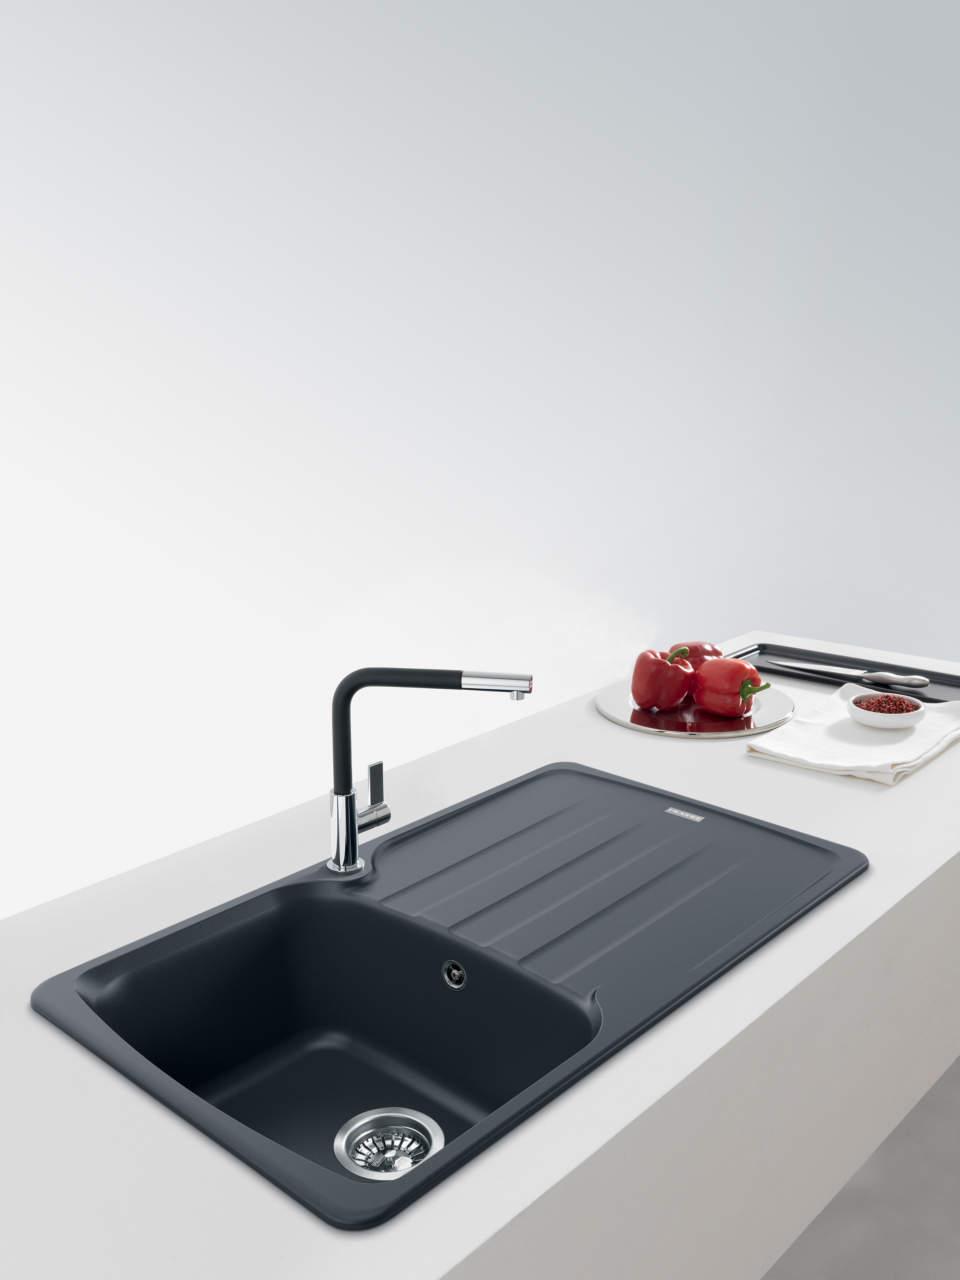 Franke lancia nuove nuance per i lavelli in Fragranite | Ambiente ...